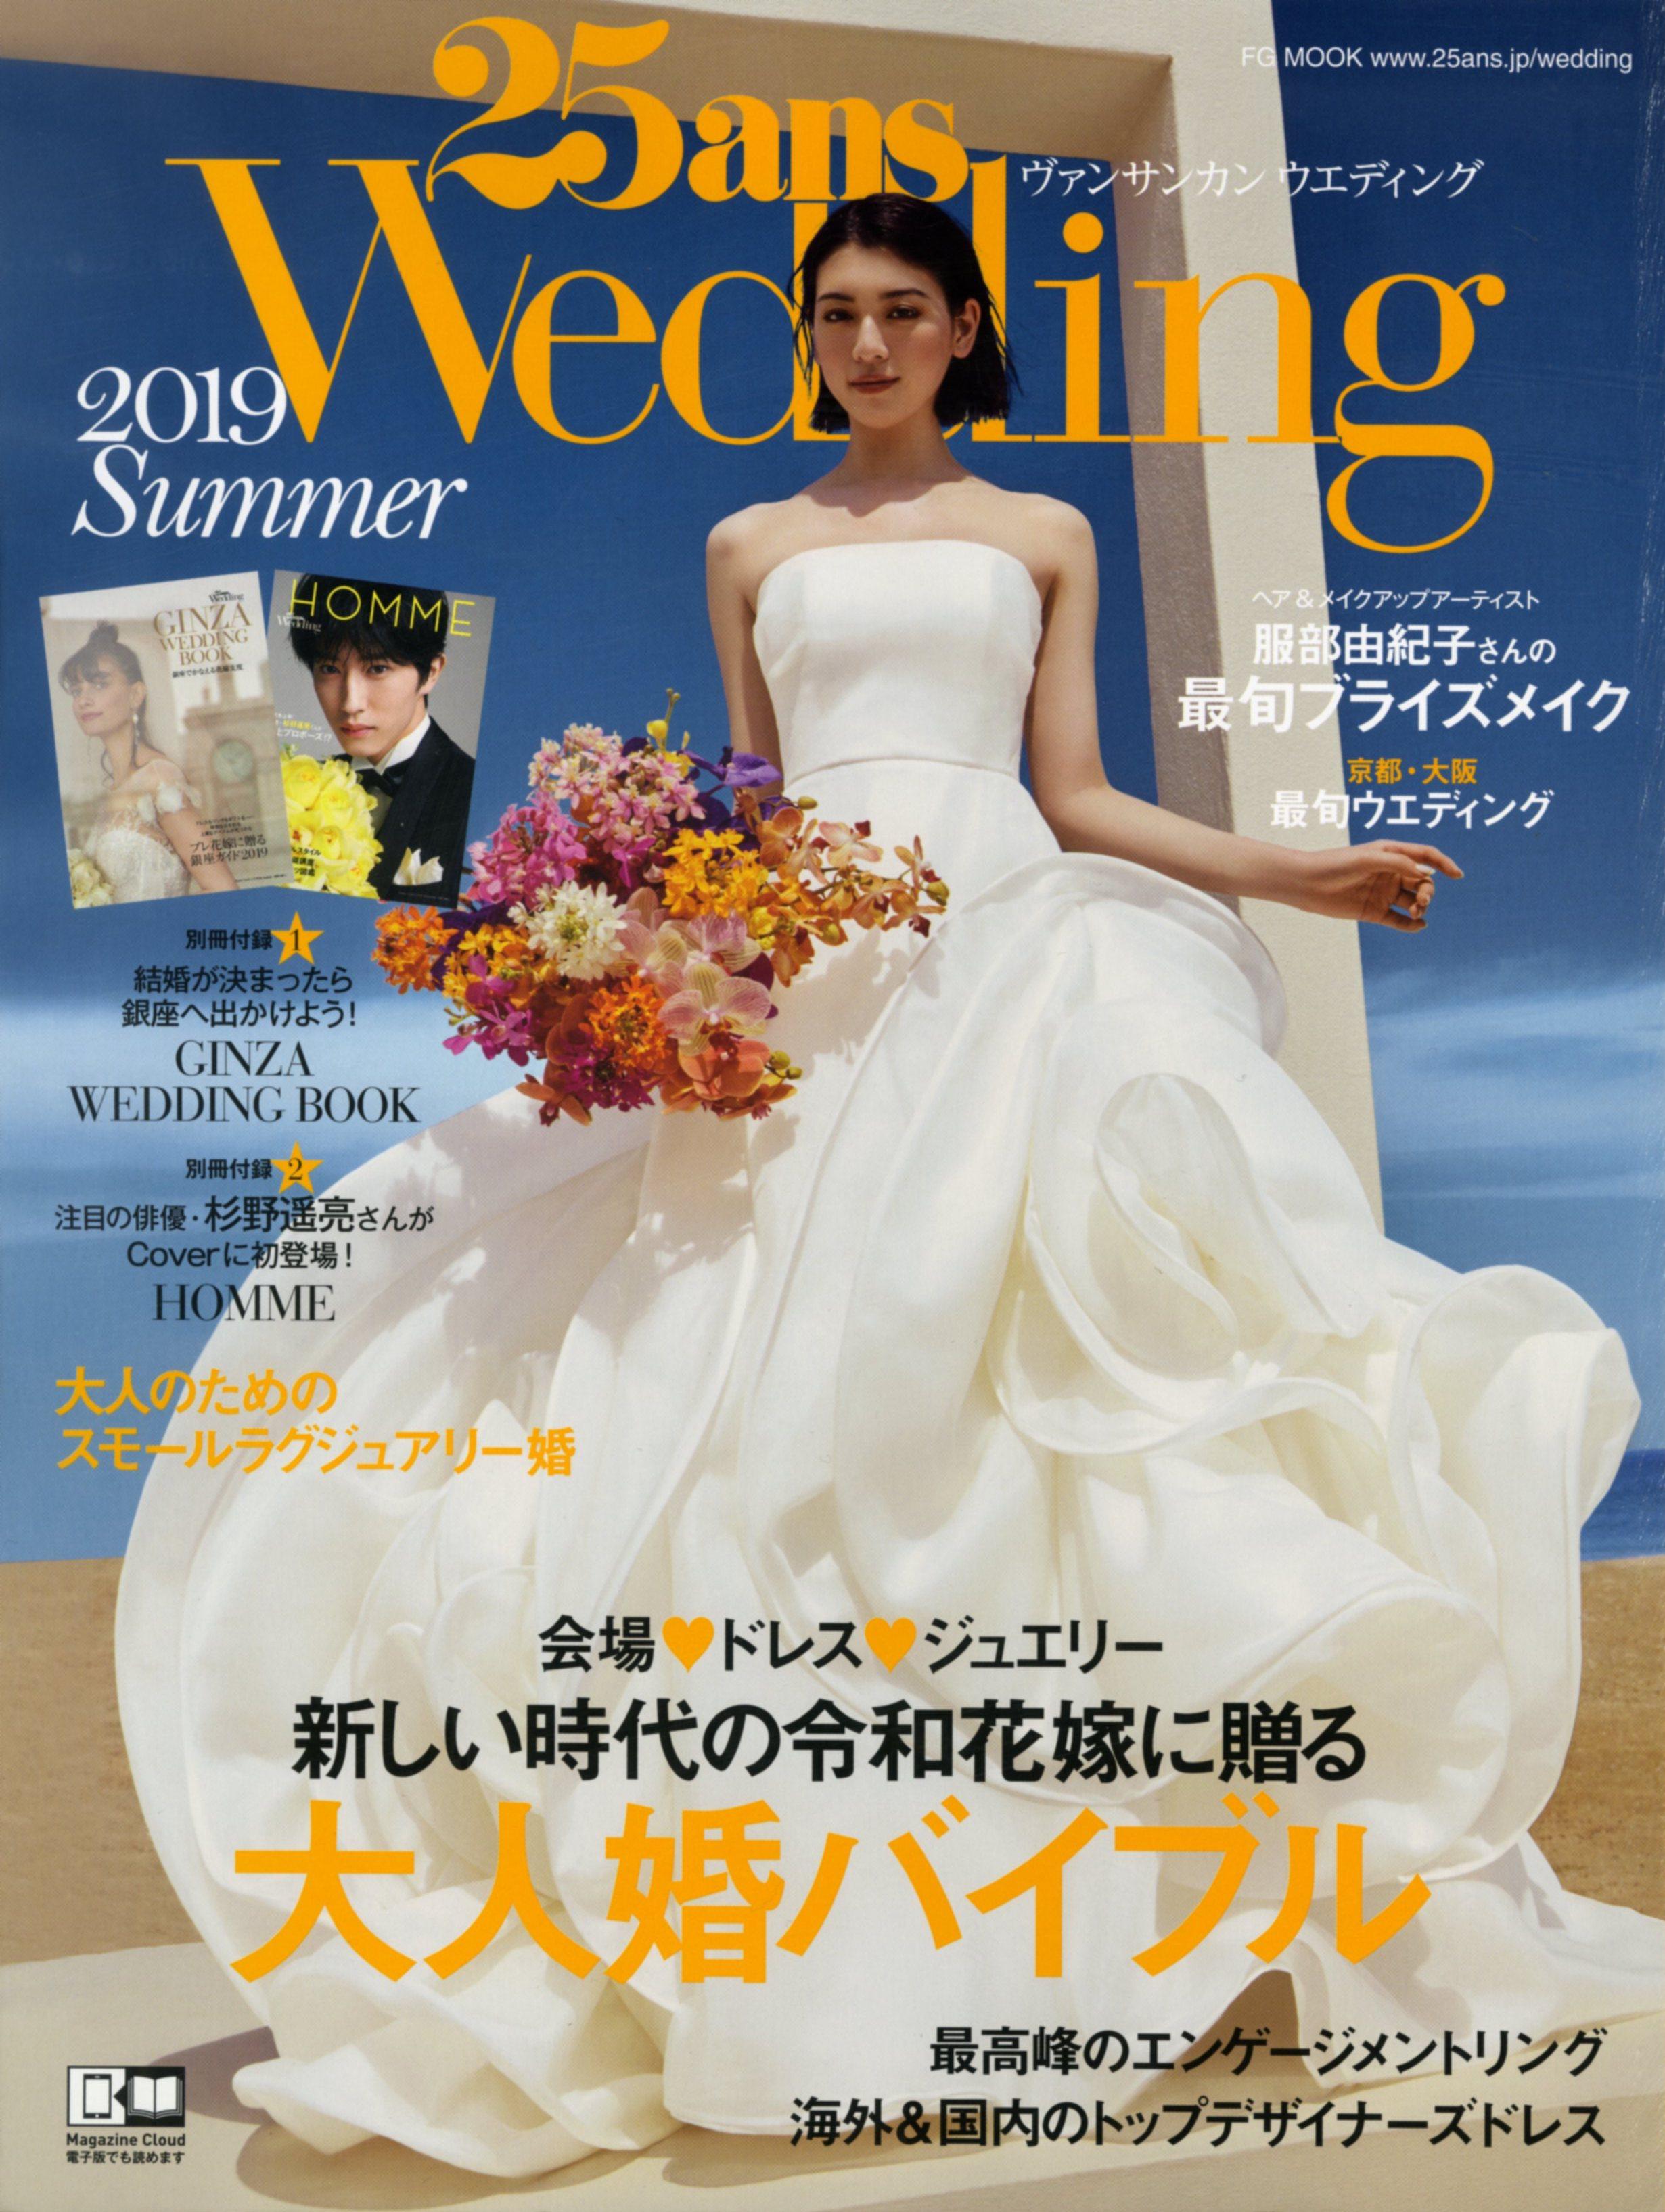 6月7日発売_25ans Wedding 2019 Summer 表紙